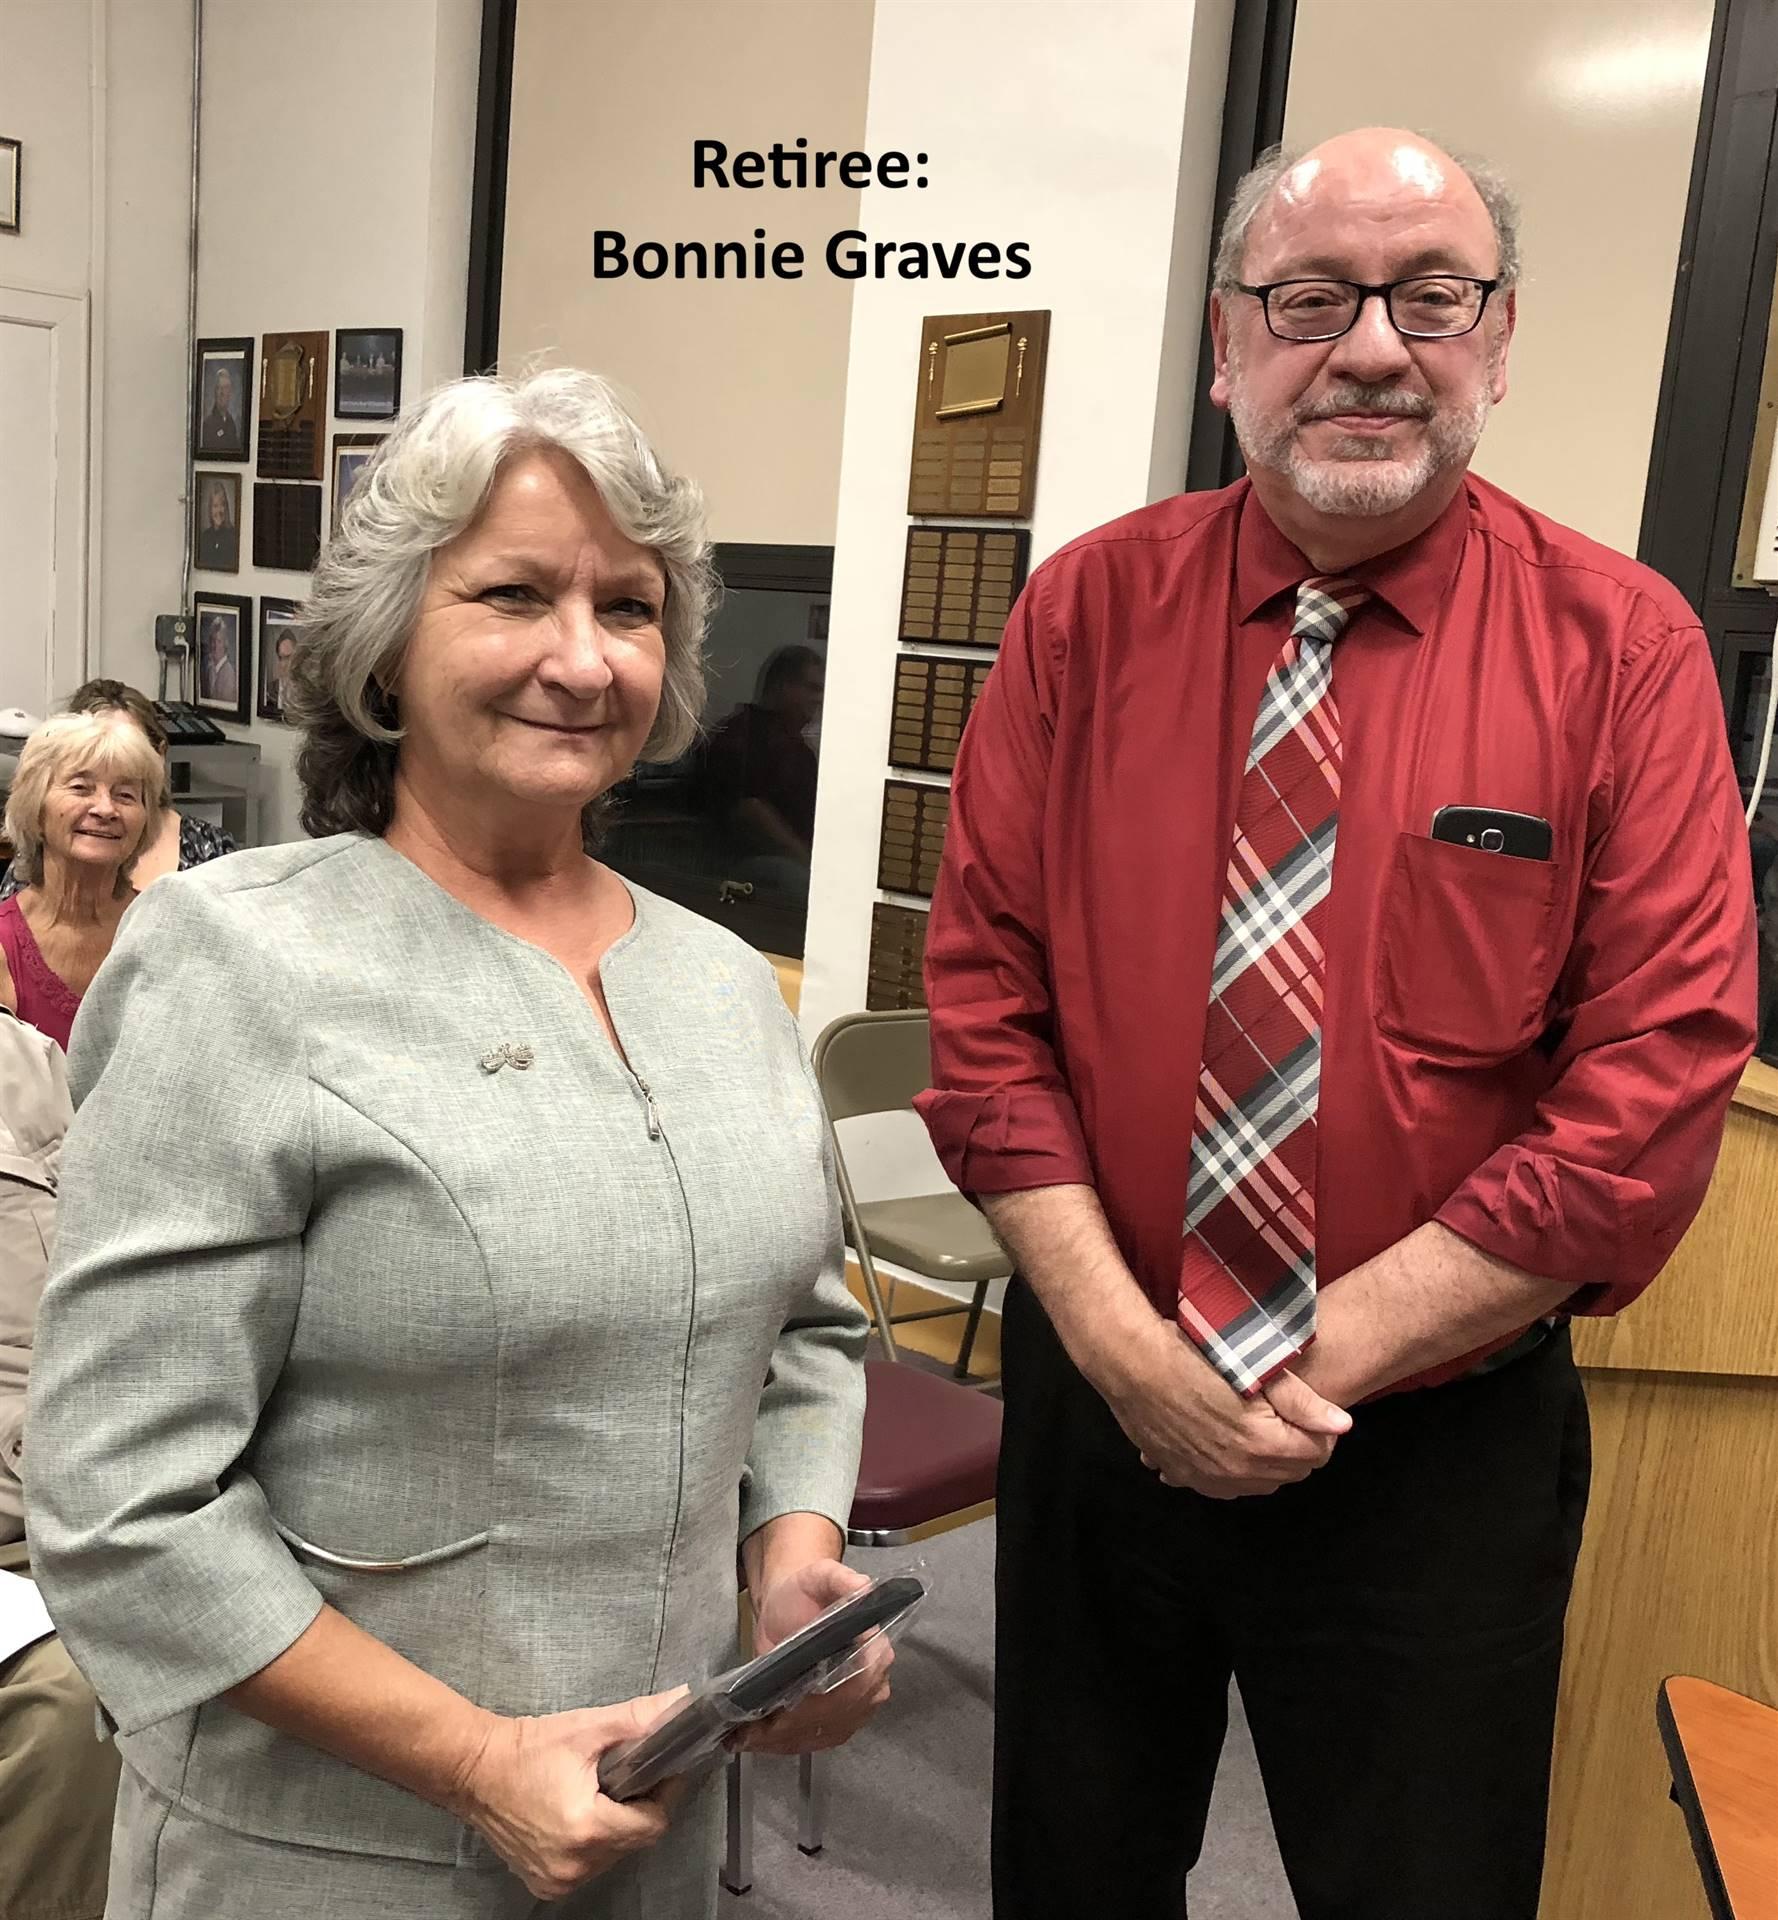 Retiree:  Bonnie Graves